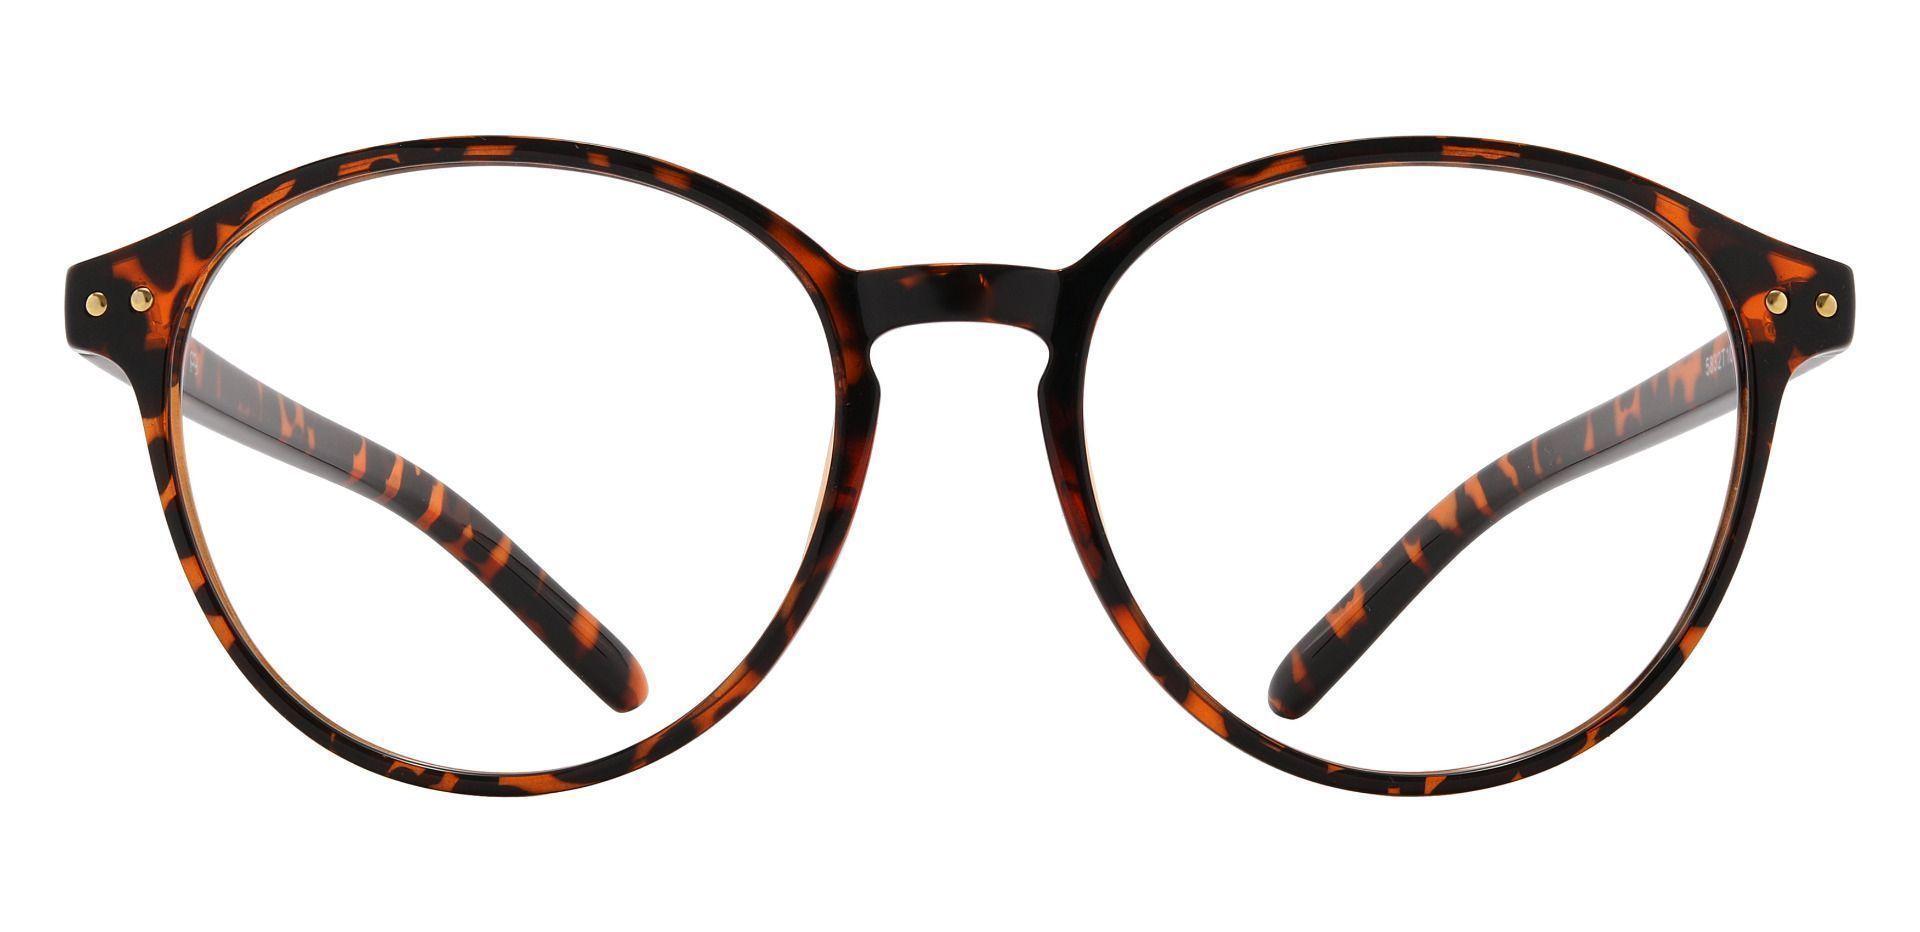 Sanger Round Prescription Glasses - Tortoise